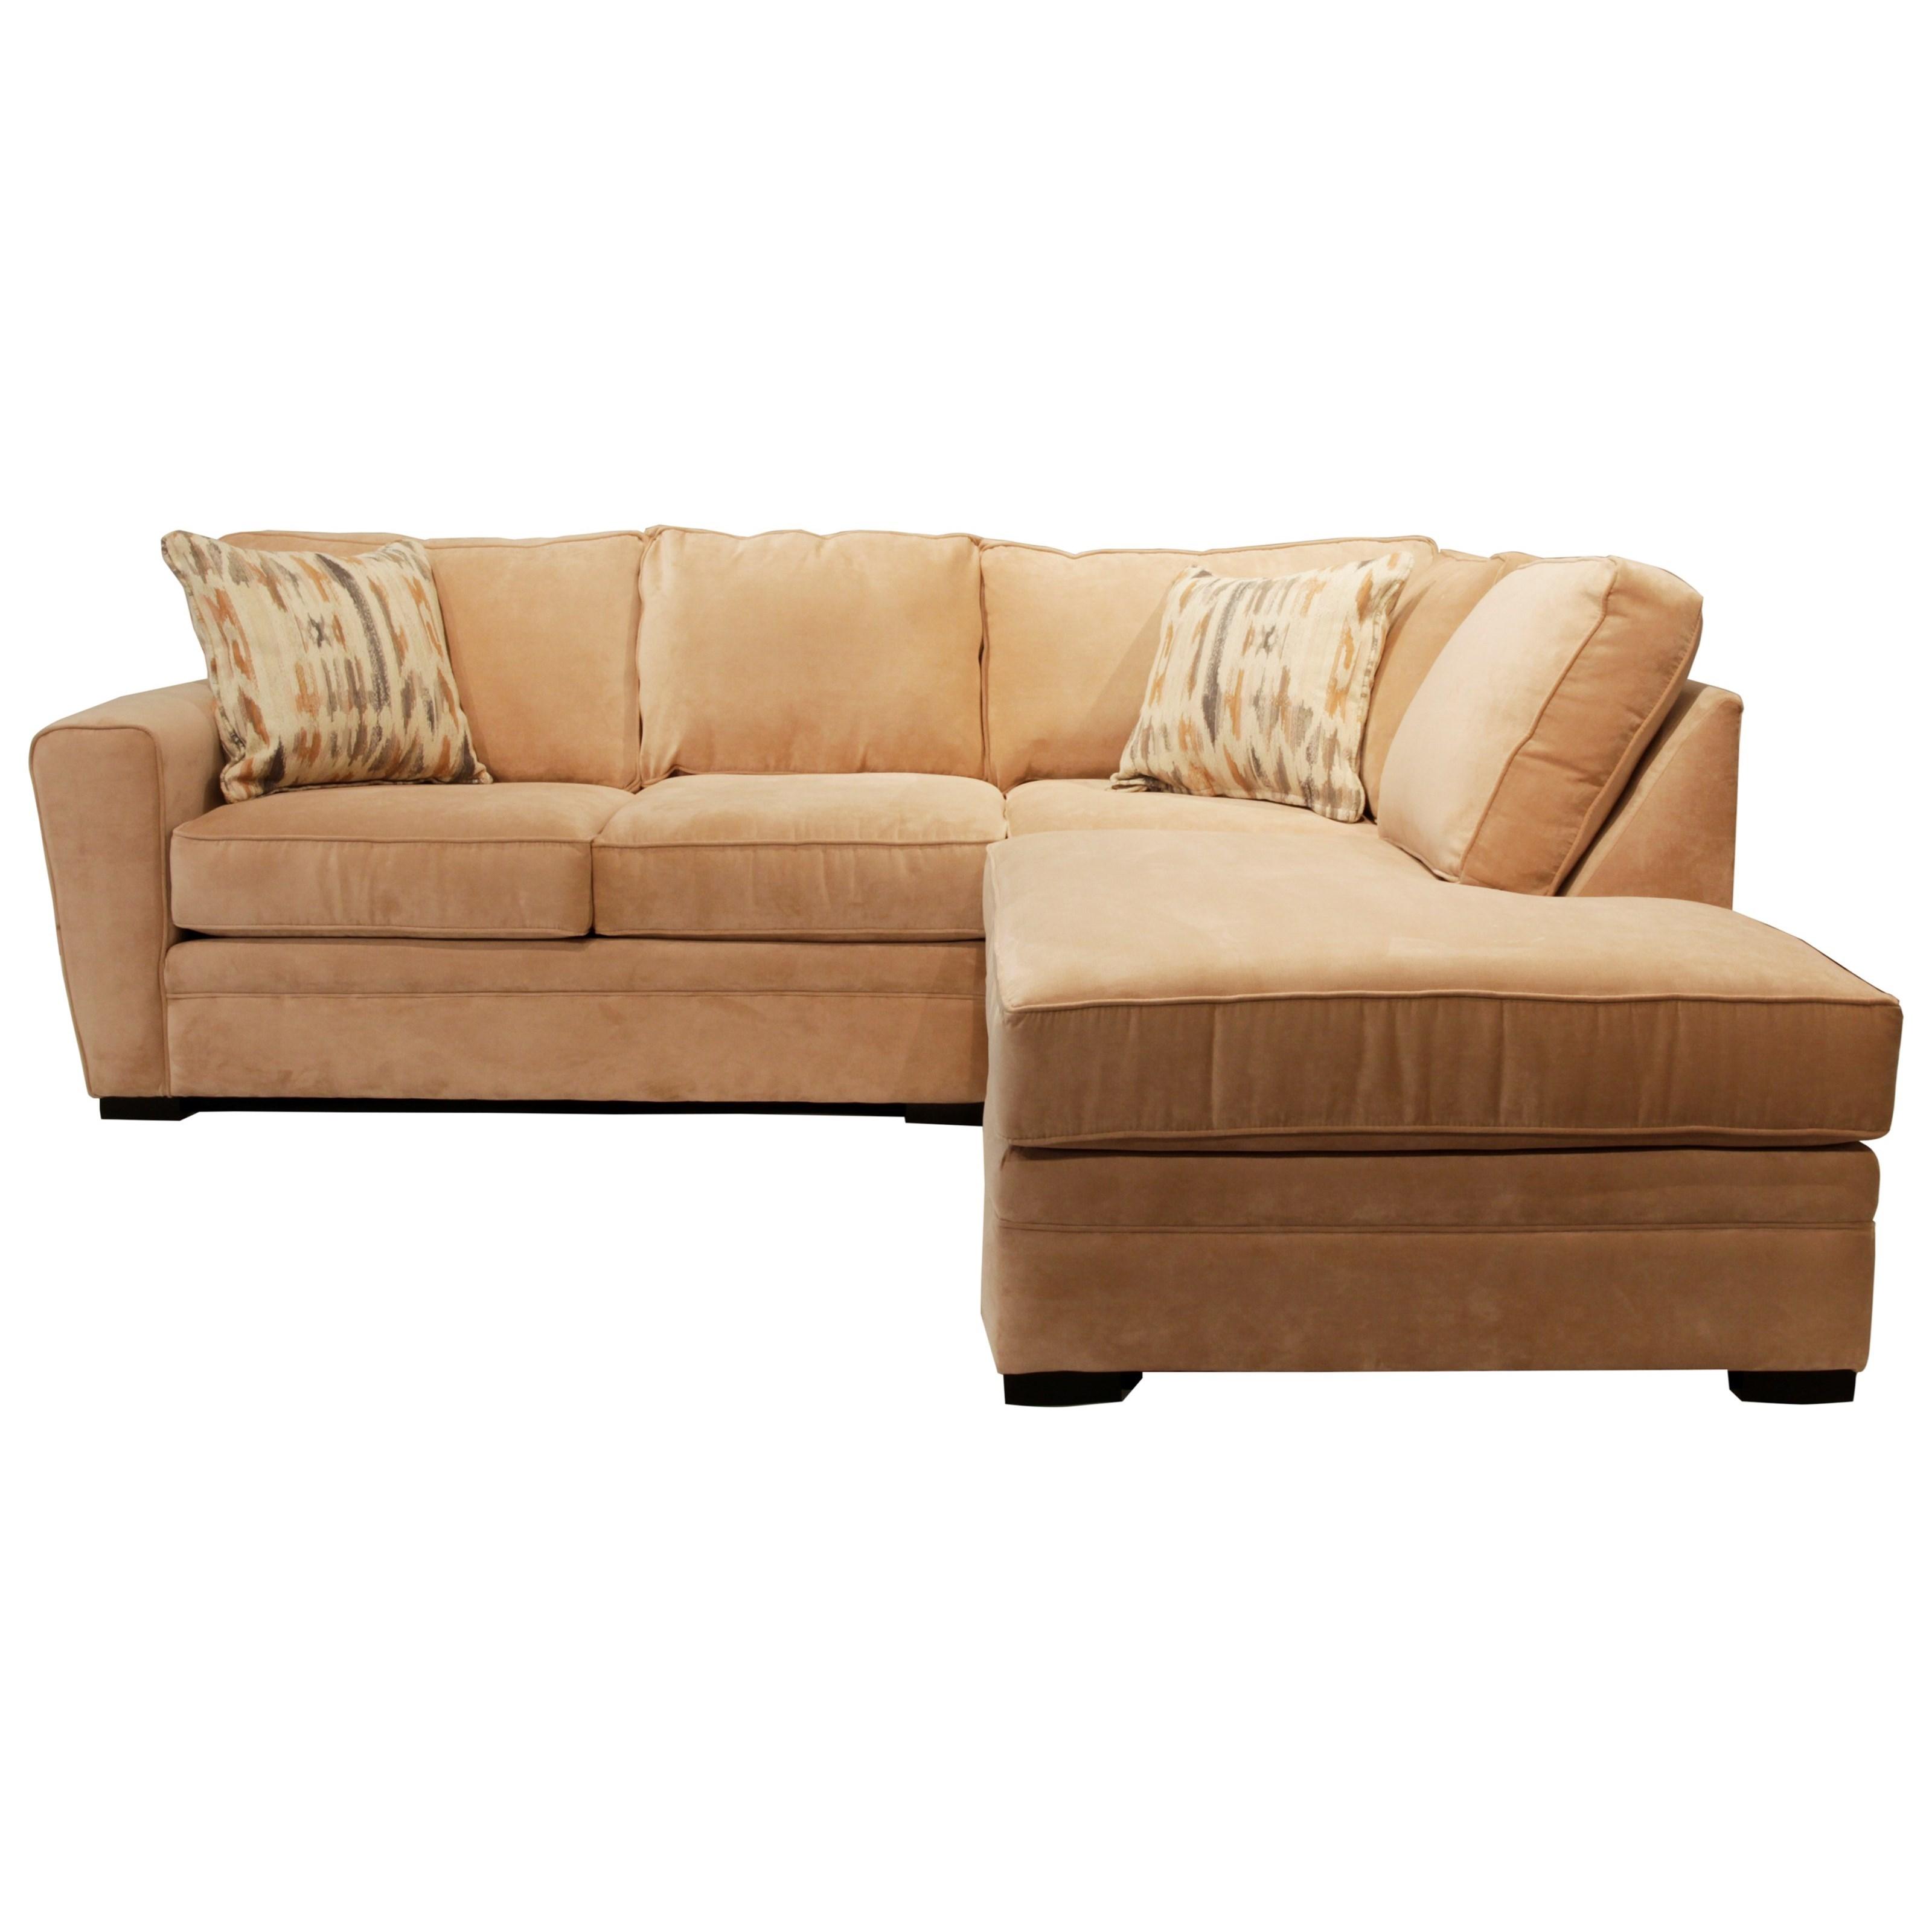 Choices - Artemis 2-Pc Chaise Sectional w/ Pluma Plush Cushion by Jonathan Louis at Fashion Furniture